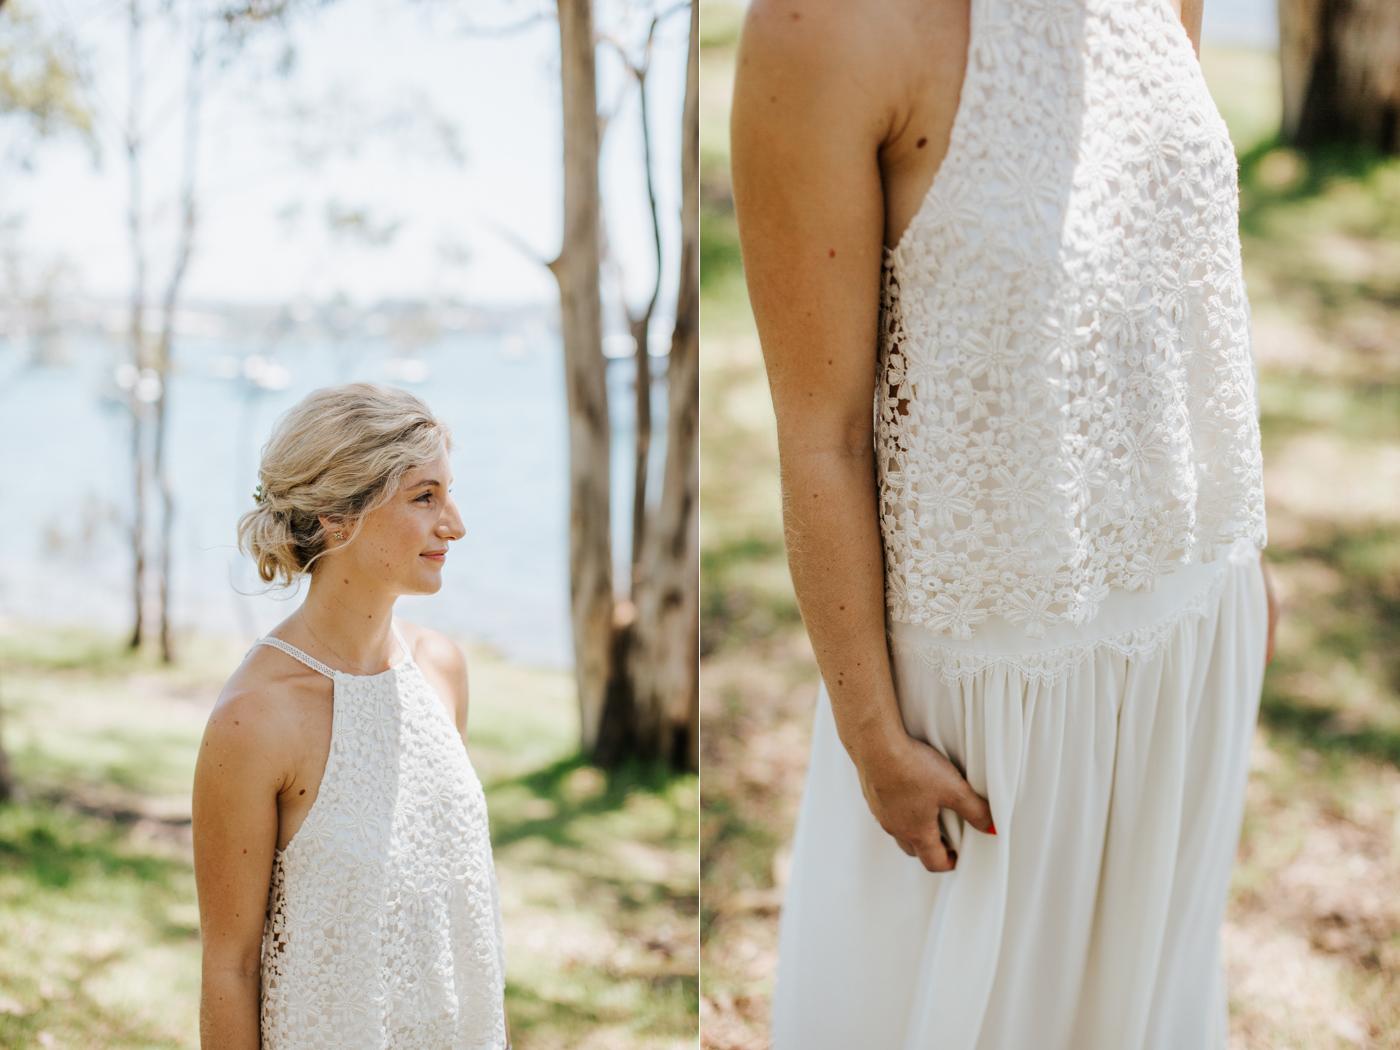 Emma & Ben - Lake Macquarie - Hunter Valley Wedding - Samantha Heather Photography-72.jpg